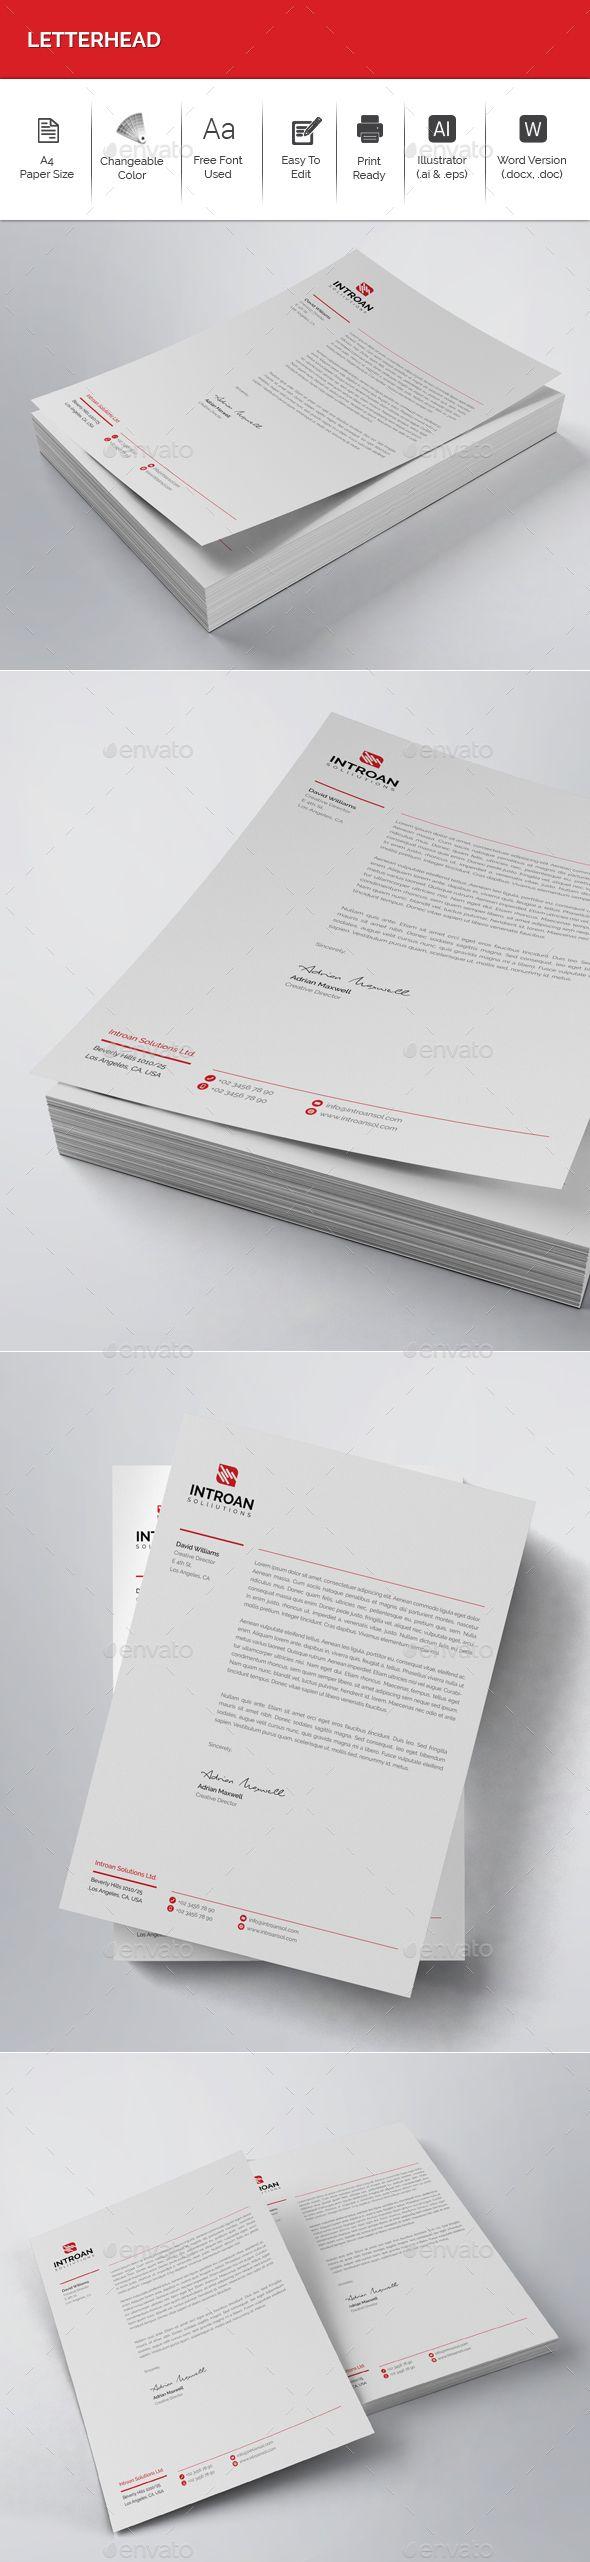 Letterhead letterhead template stationery printing and print letterhead spiritdancerdesigns Images